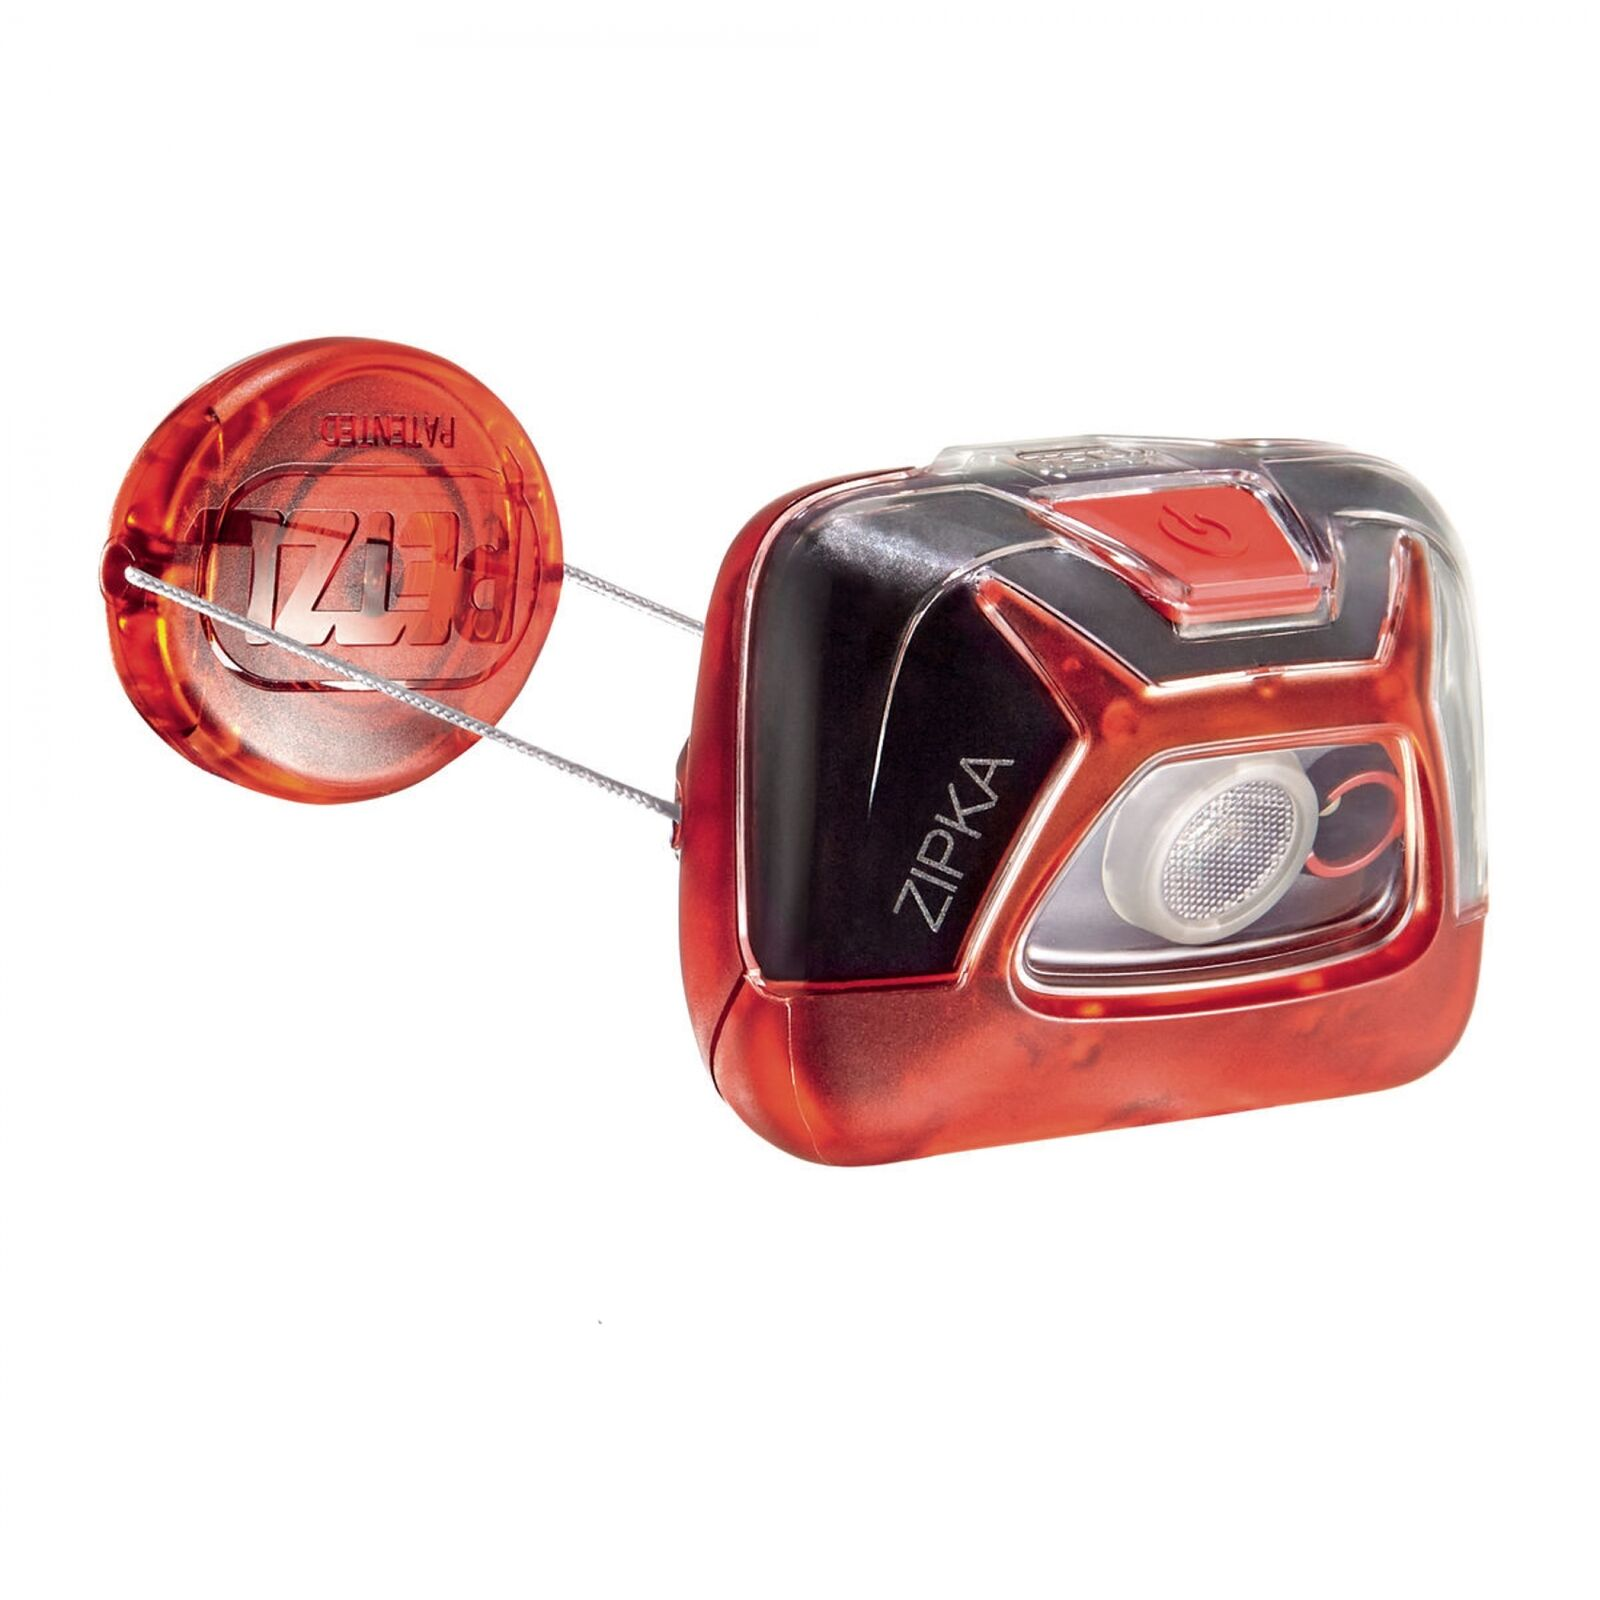 Petzl Zipka Stirnlampe red Ultrakompakt Taschenlampe